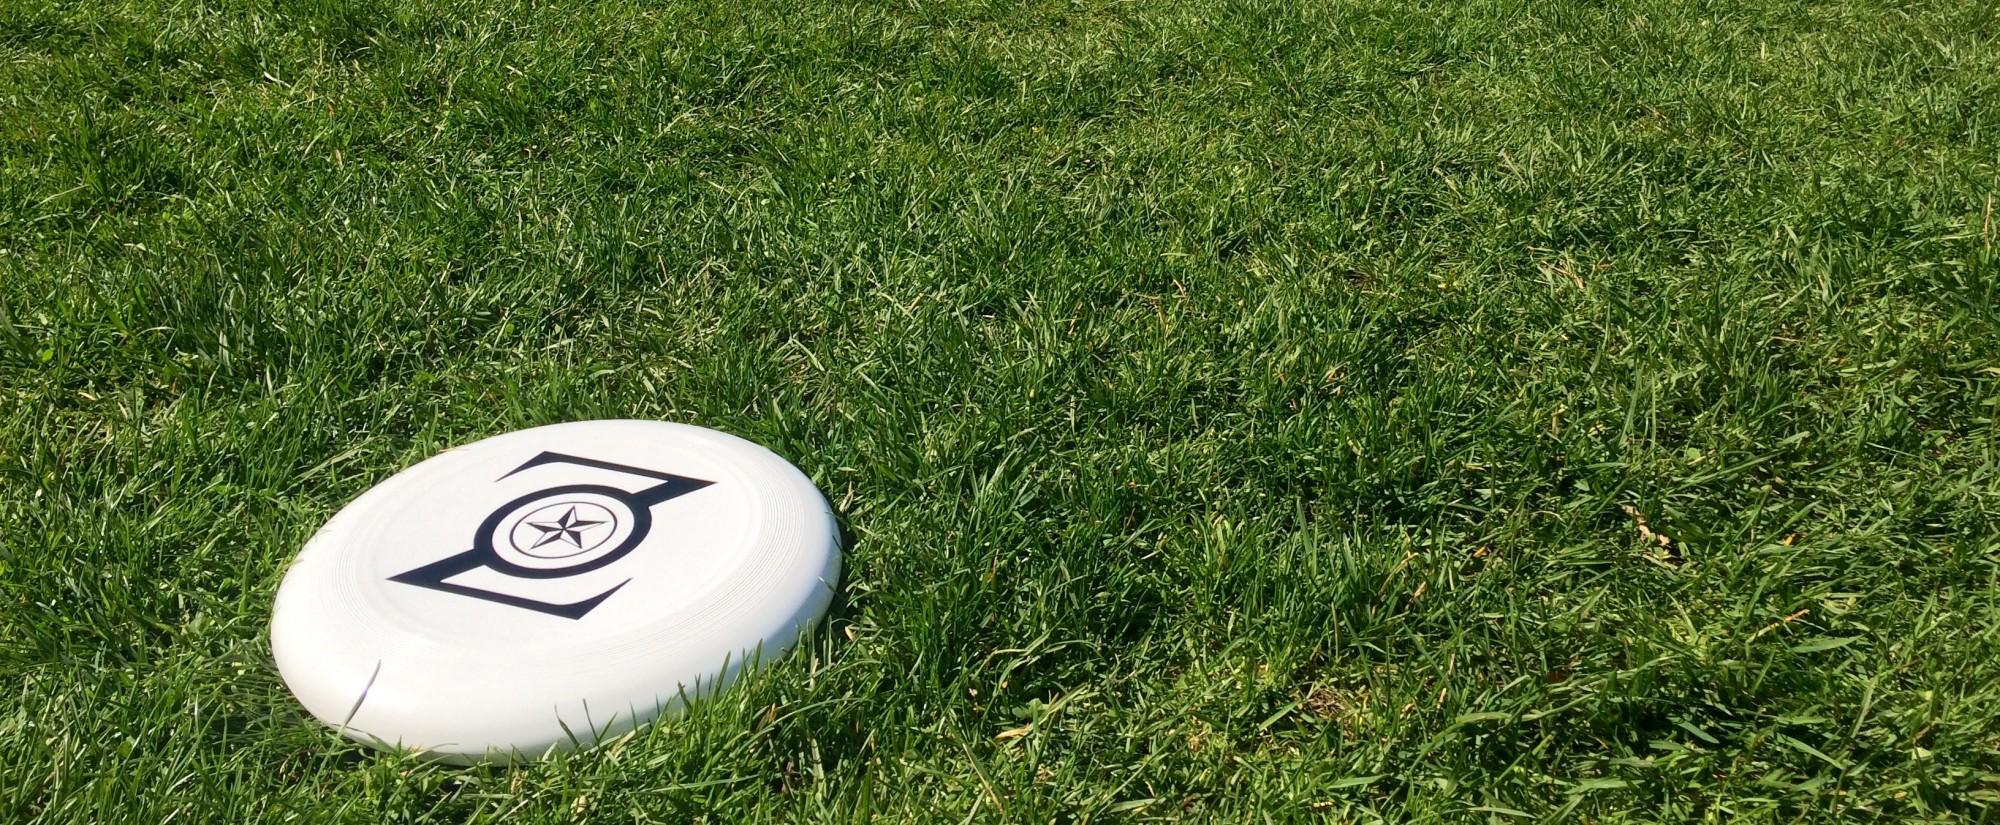 UMass Ultimate Frisbee